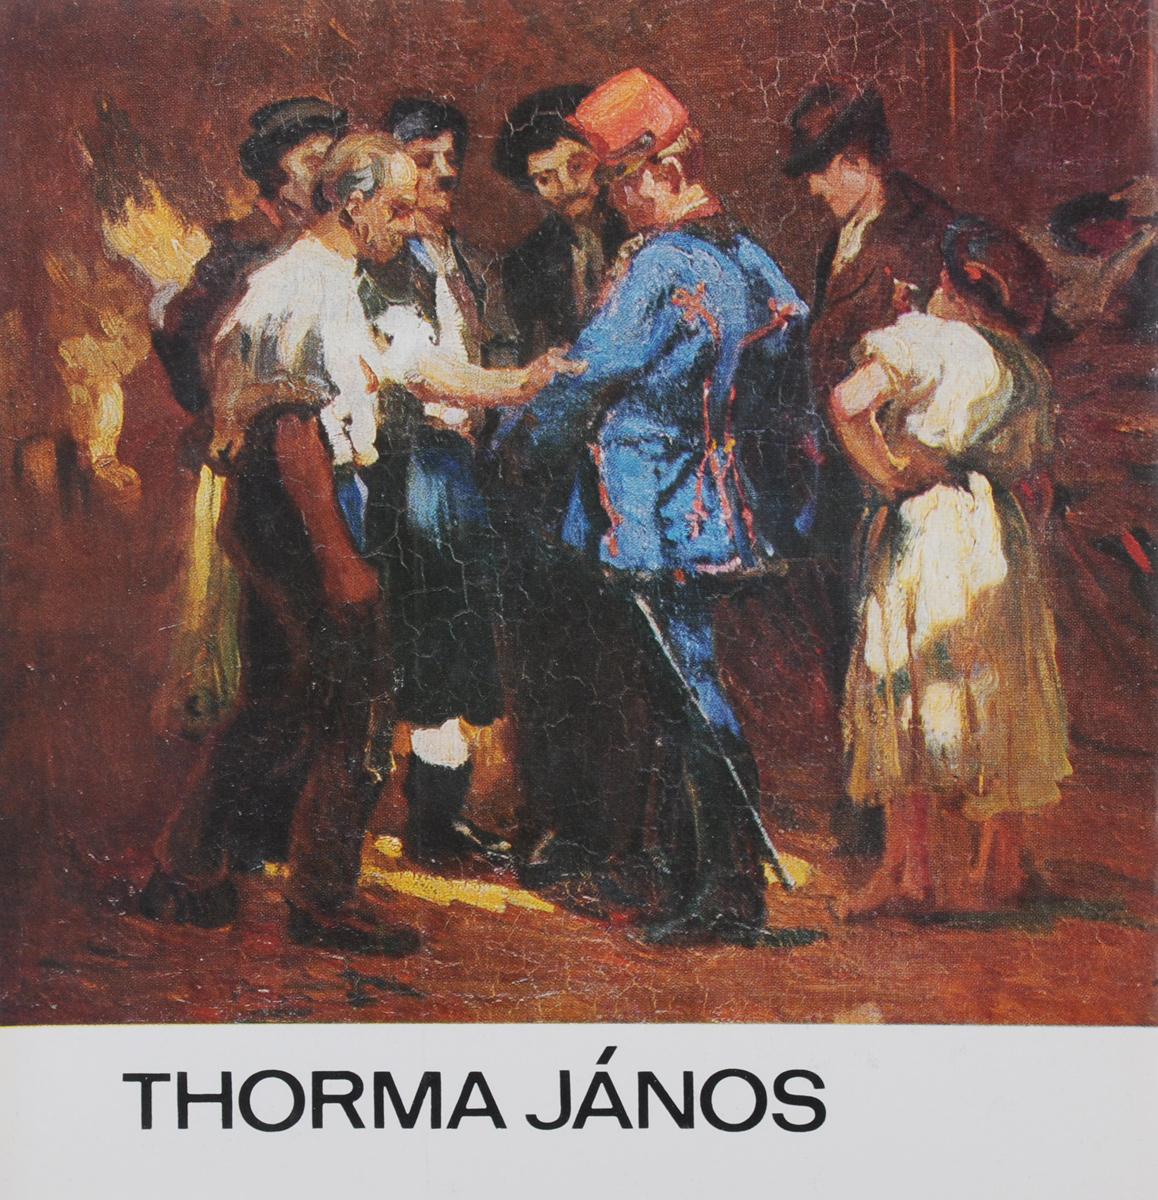 Thorma Janos